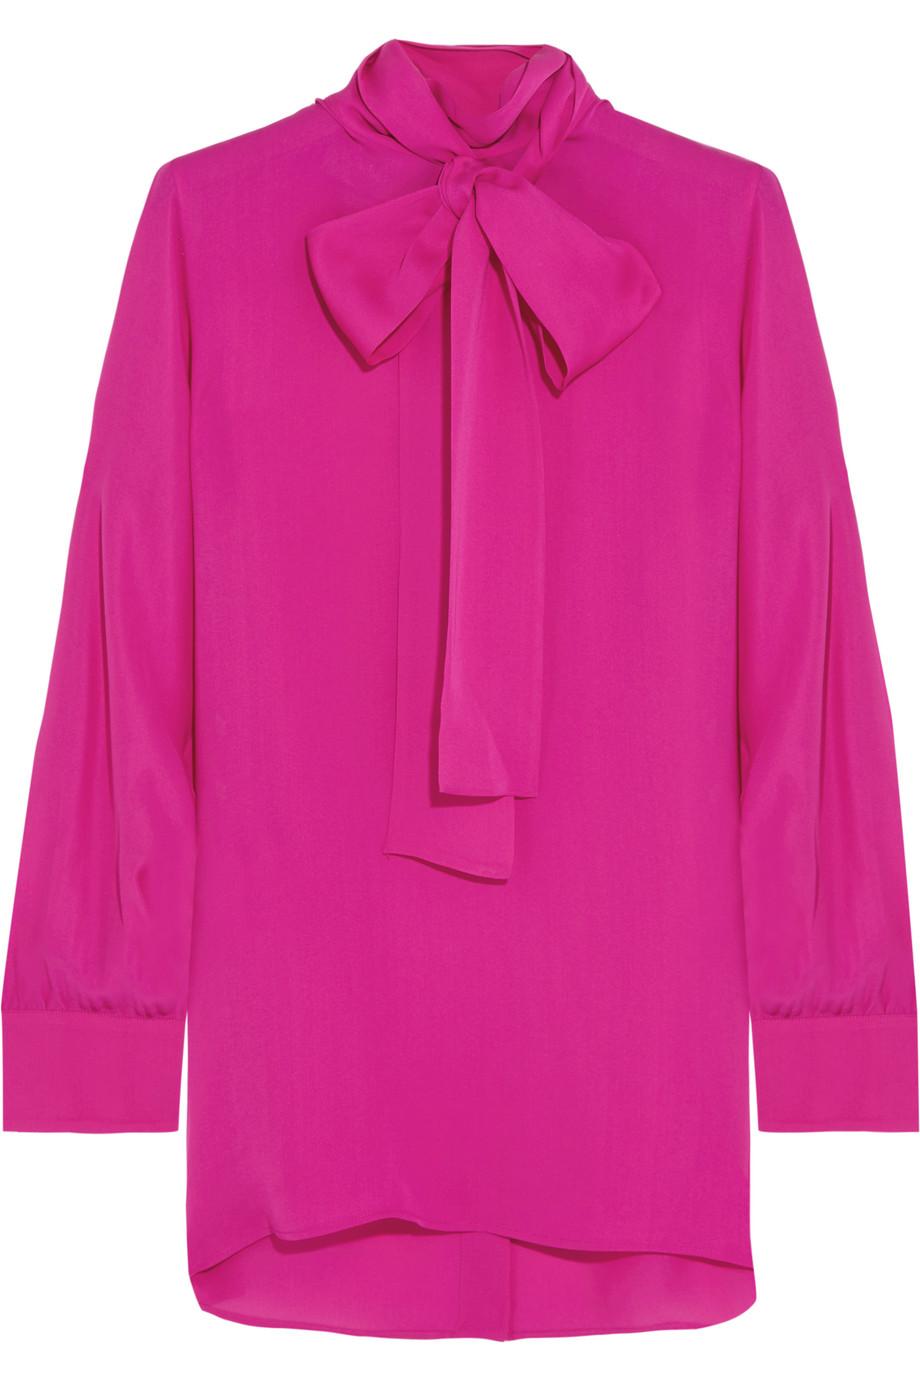 Gucci Pussy-Bow Silk Crepe De Chine Shirt, Fuchsia, Women's, Size: 42